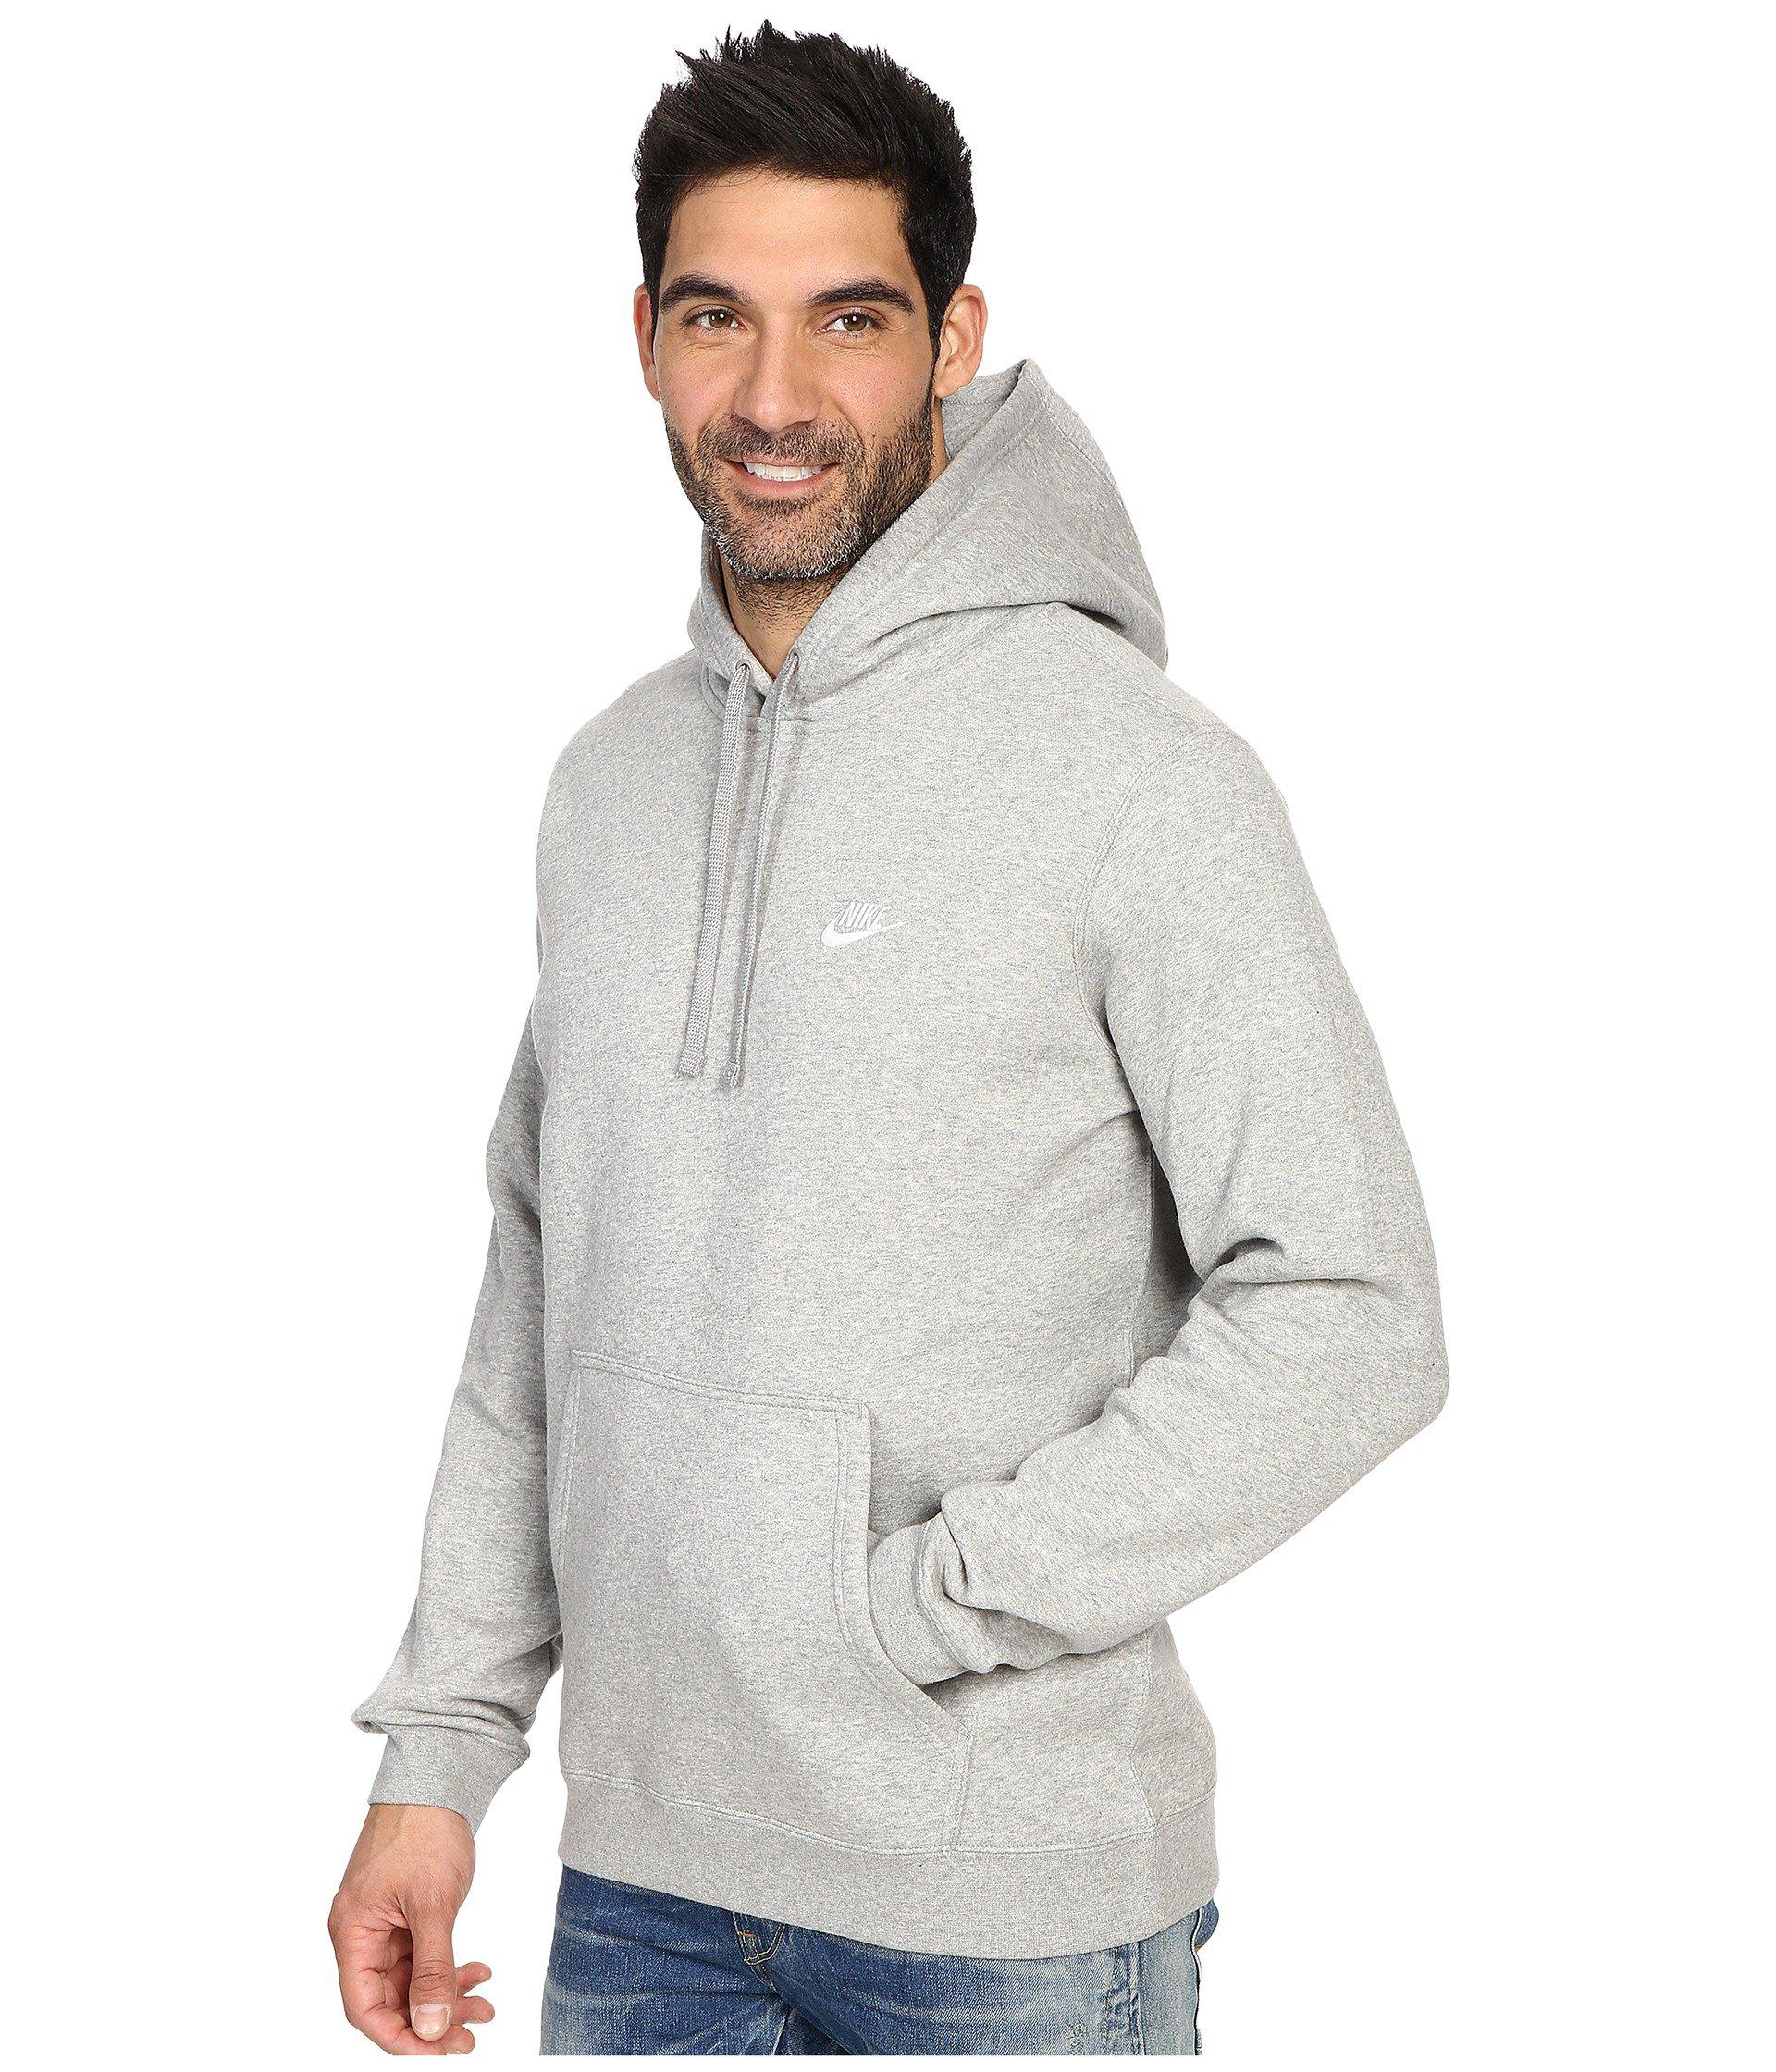 9244e4fbacf5cc Lyst - Nike Club Fleece Pullover Hoodie (black black white) Men s Fleece in  Gray for Men - Save 25%